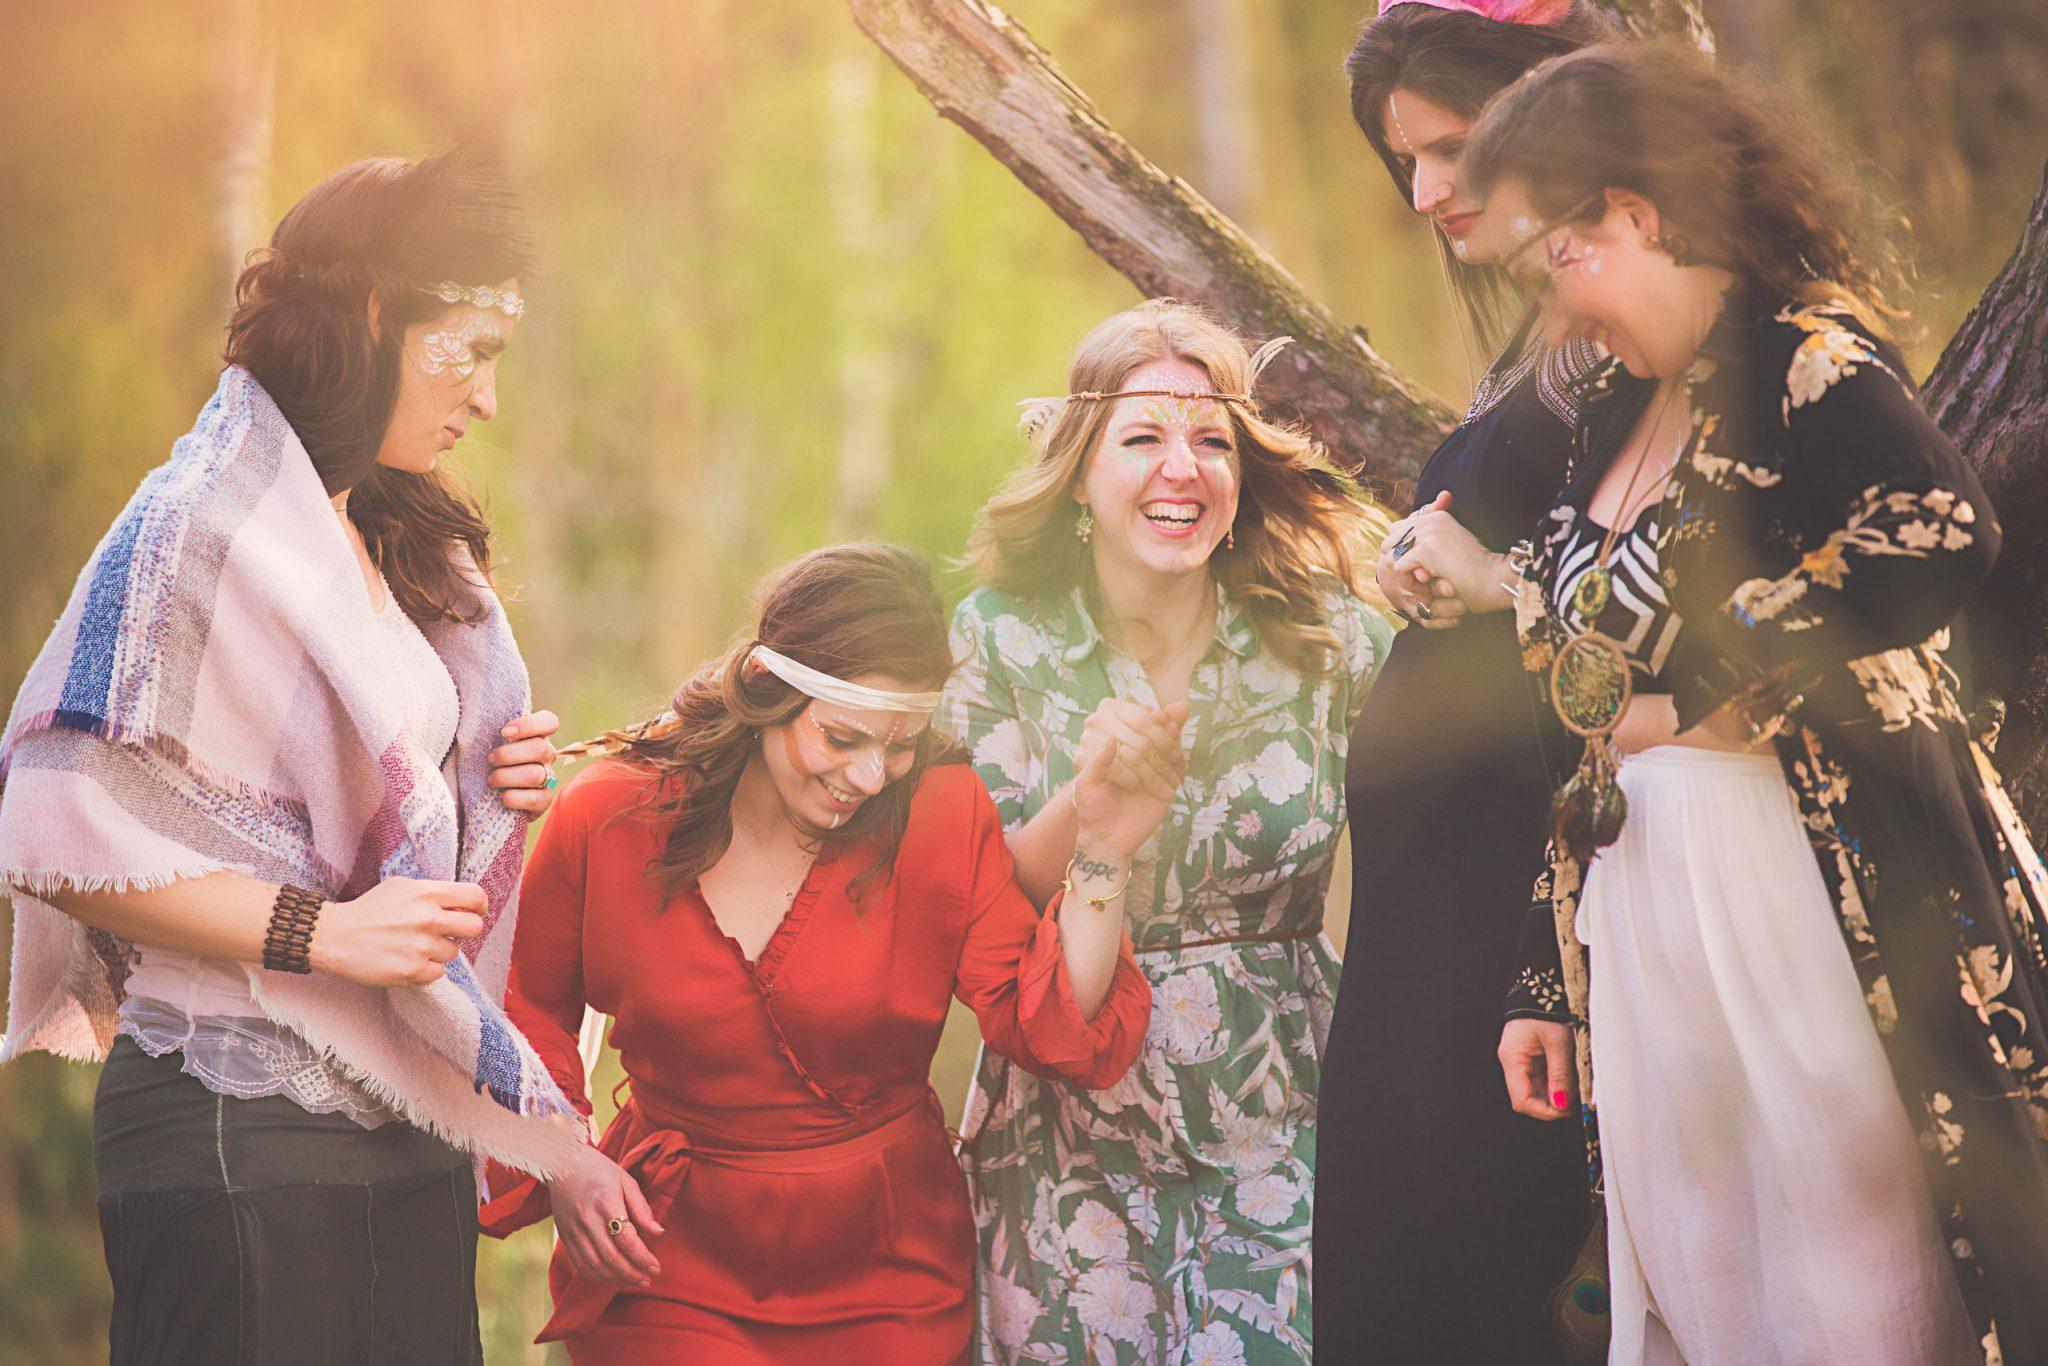 lachende vrouwen in het bos - afb aanmelden HOLY sharing circle - afb mijn afspraken